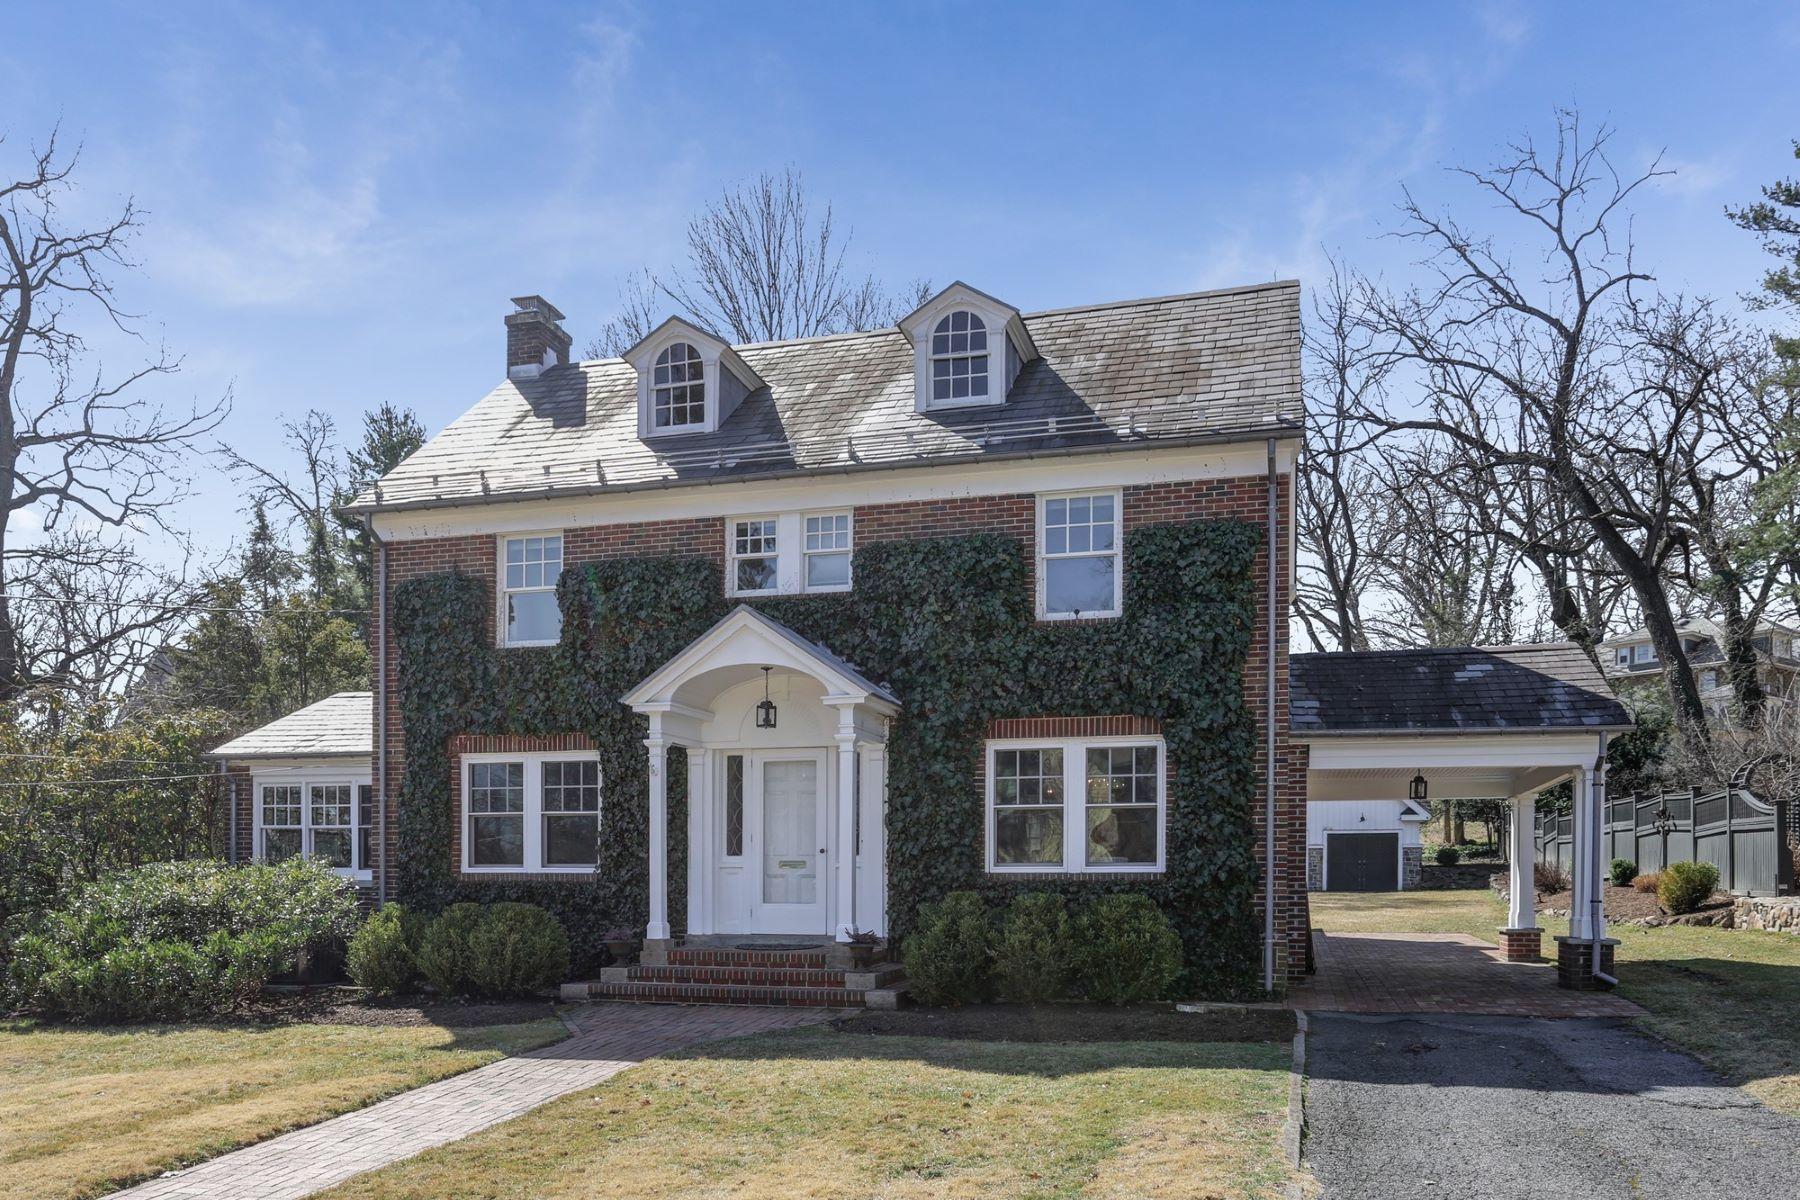 Single Family Homes для того Продажа на Gracious and Charming Colonial 19 Vinton Road, Madison, Нью-Джерси 07940 Соединенные Штаты